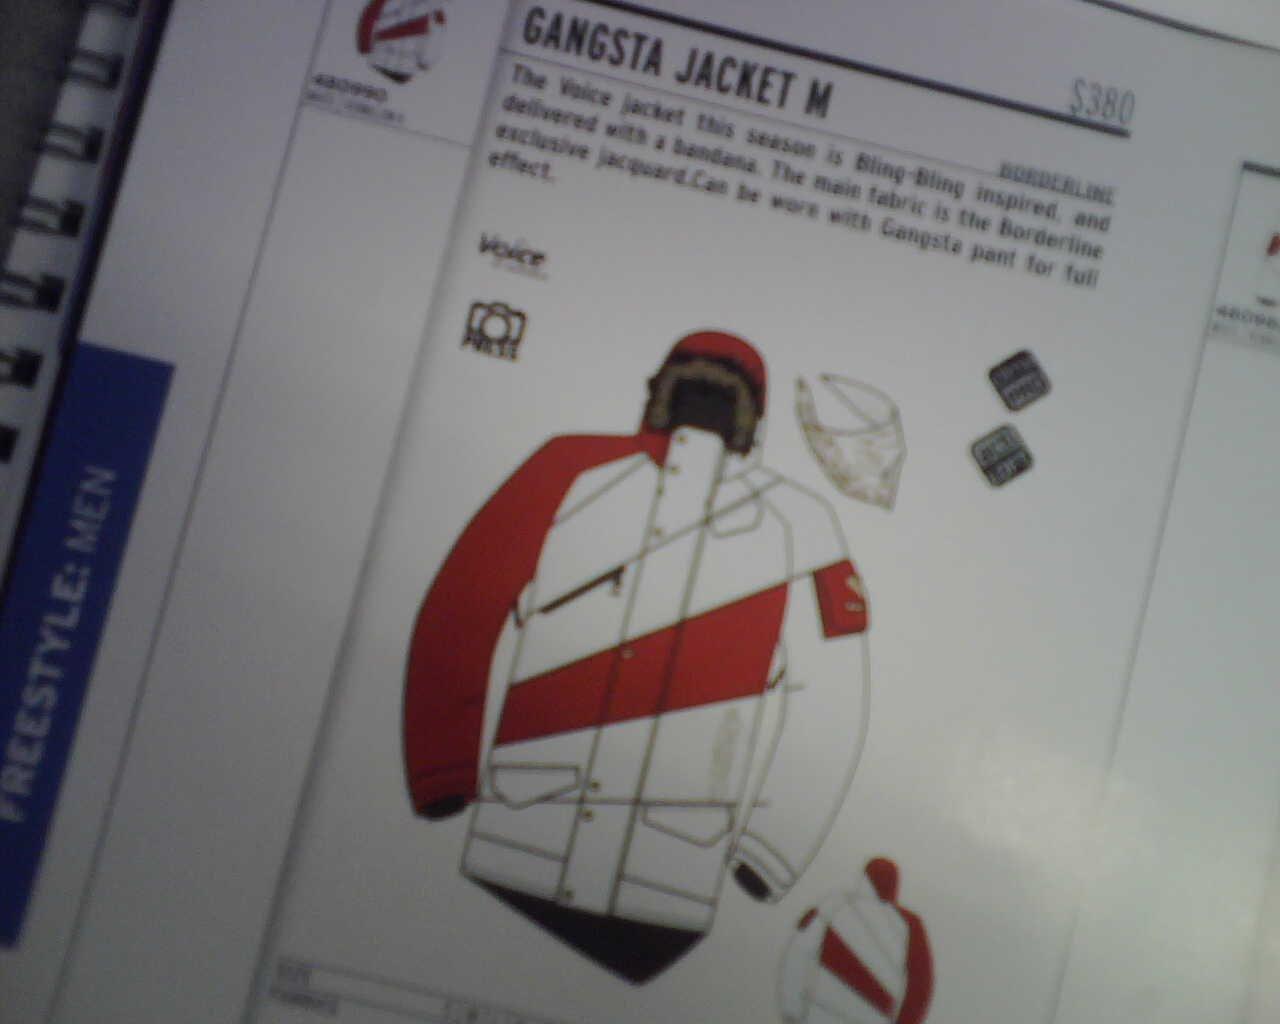 08/09 Salomon - Gangsta Jacket